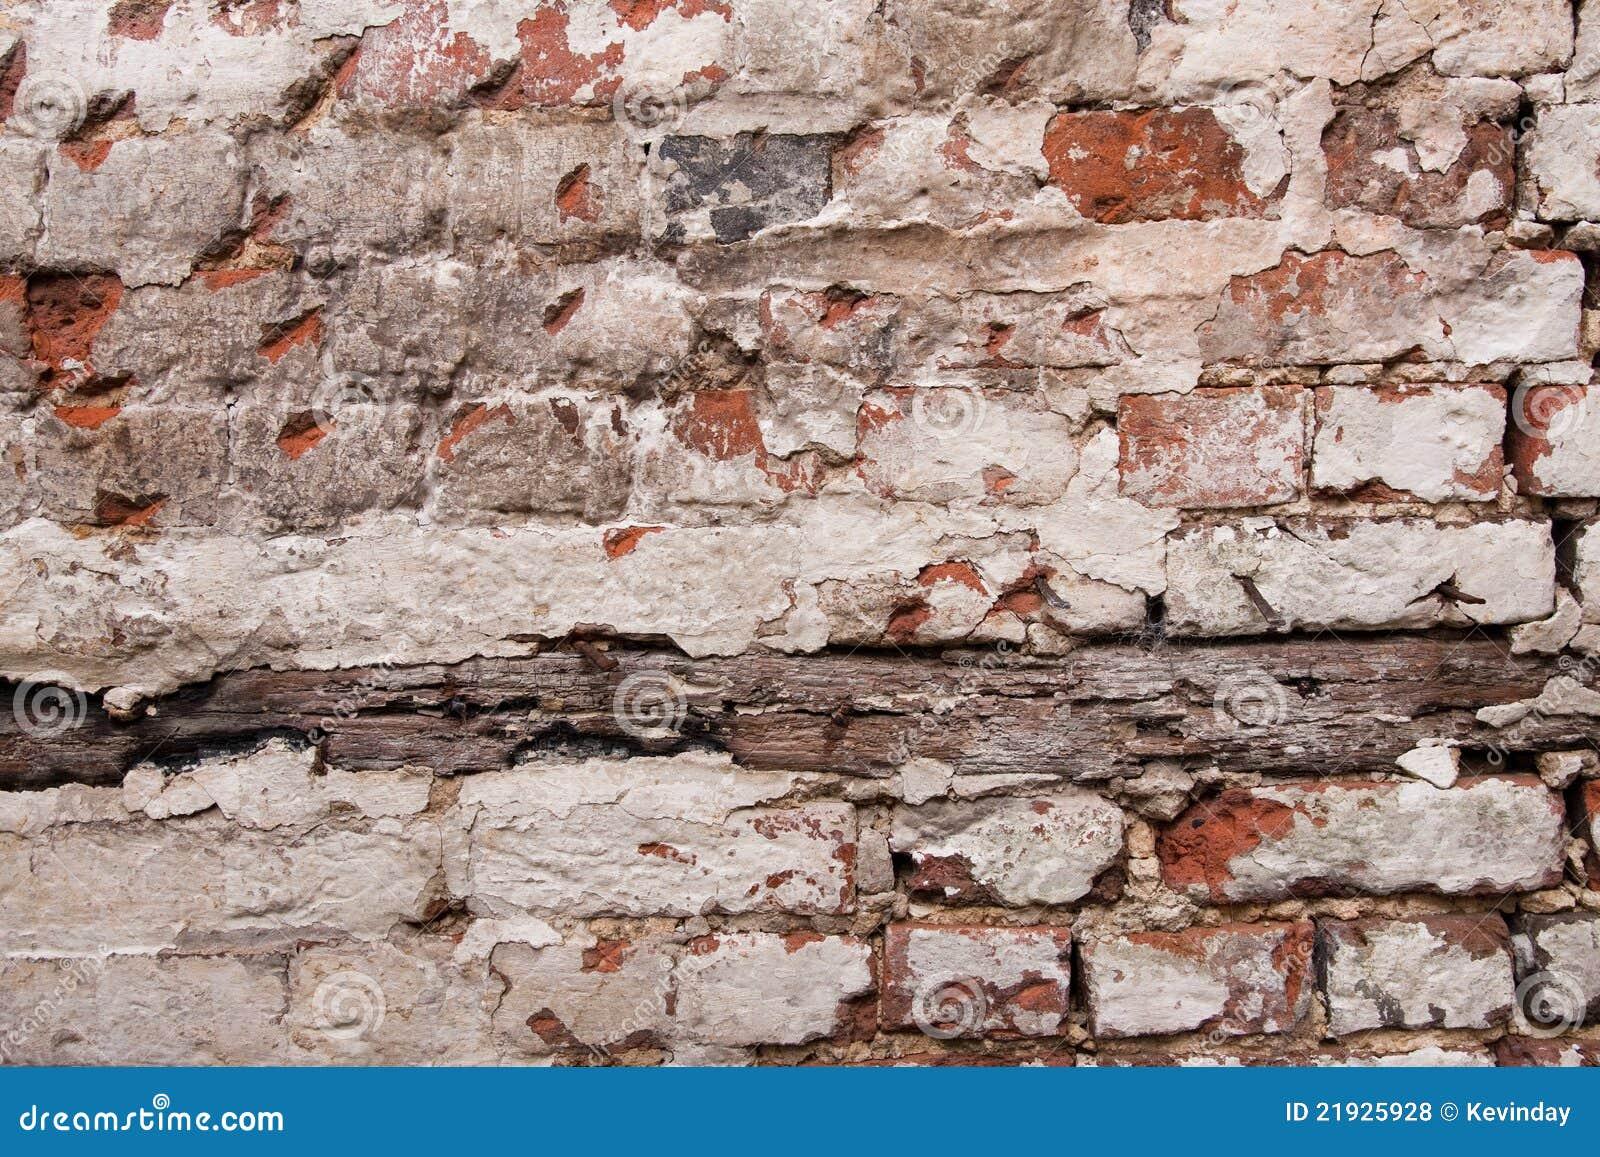 Paint Peeling Off Brick Wall Royalty Free Stock Photos